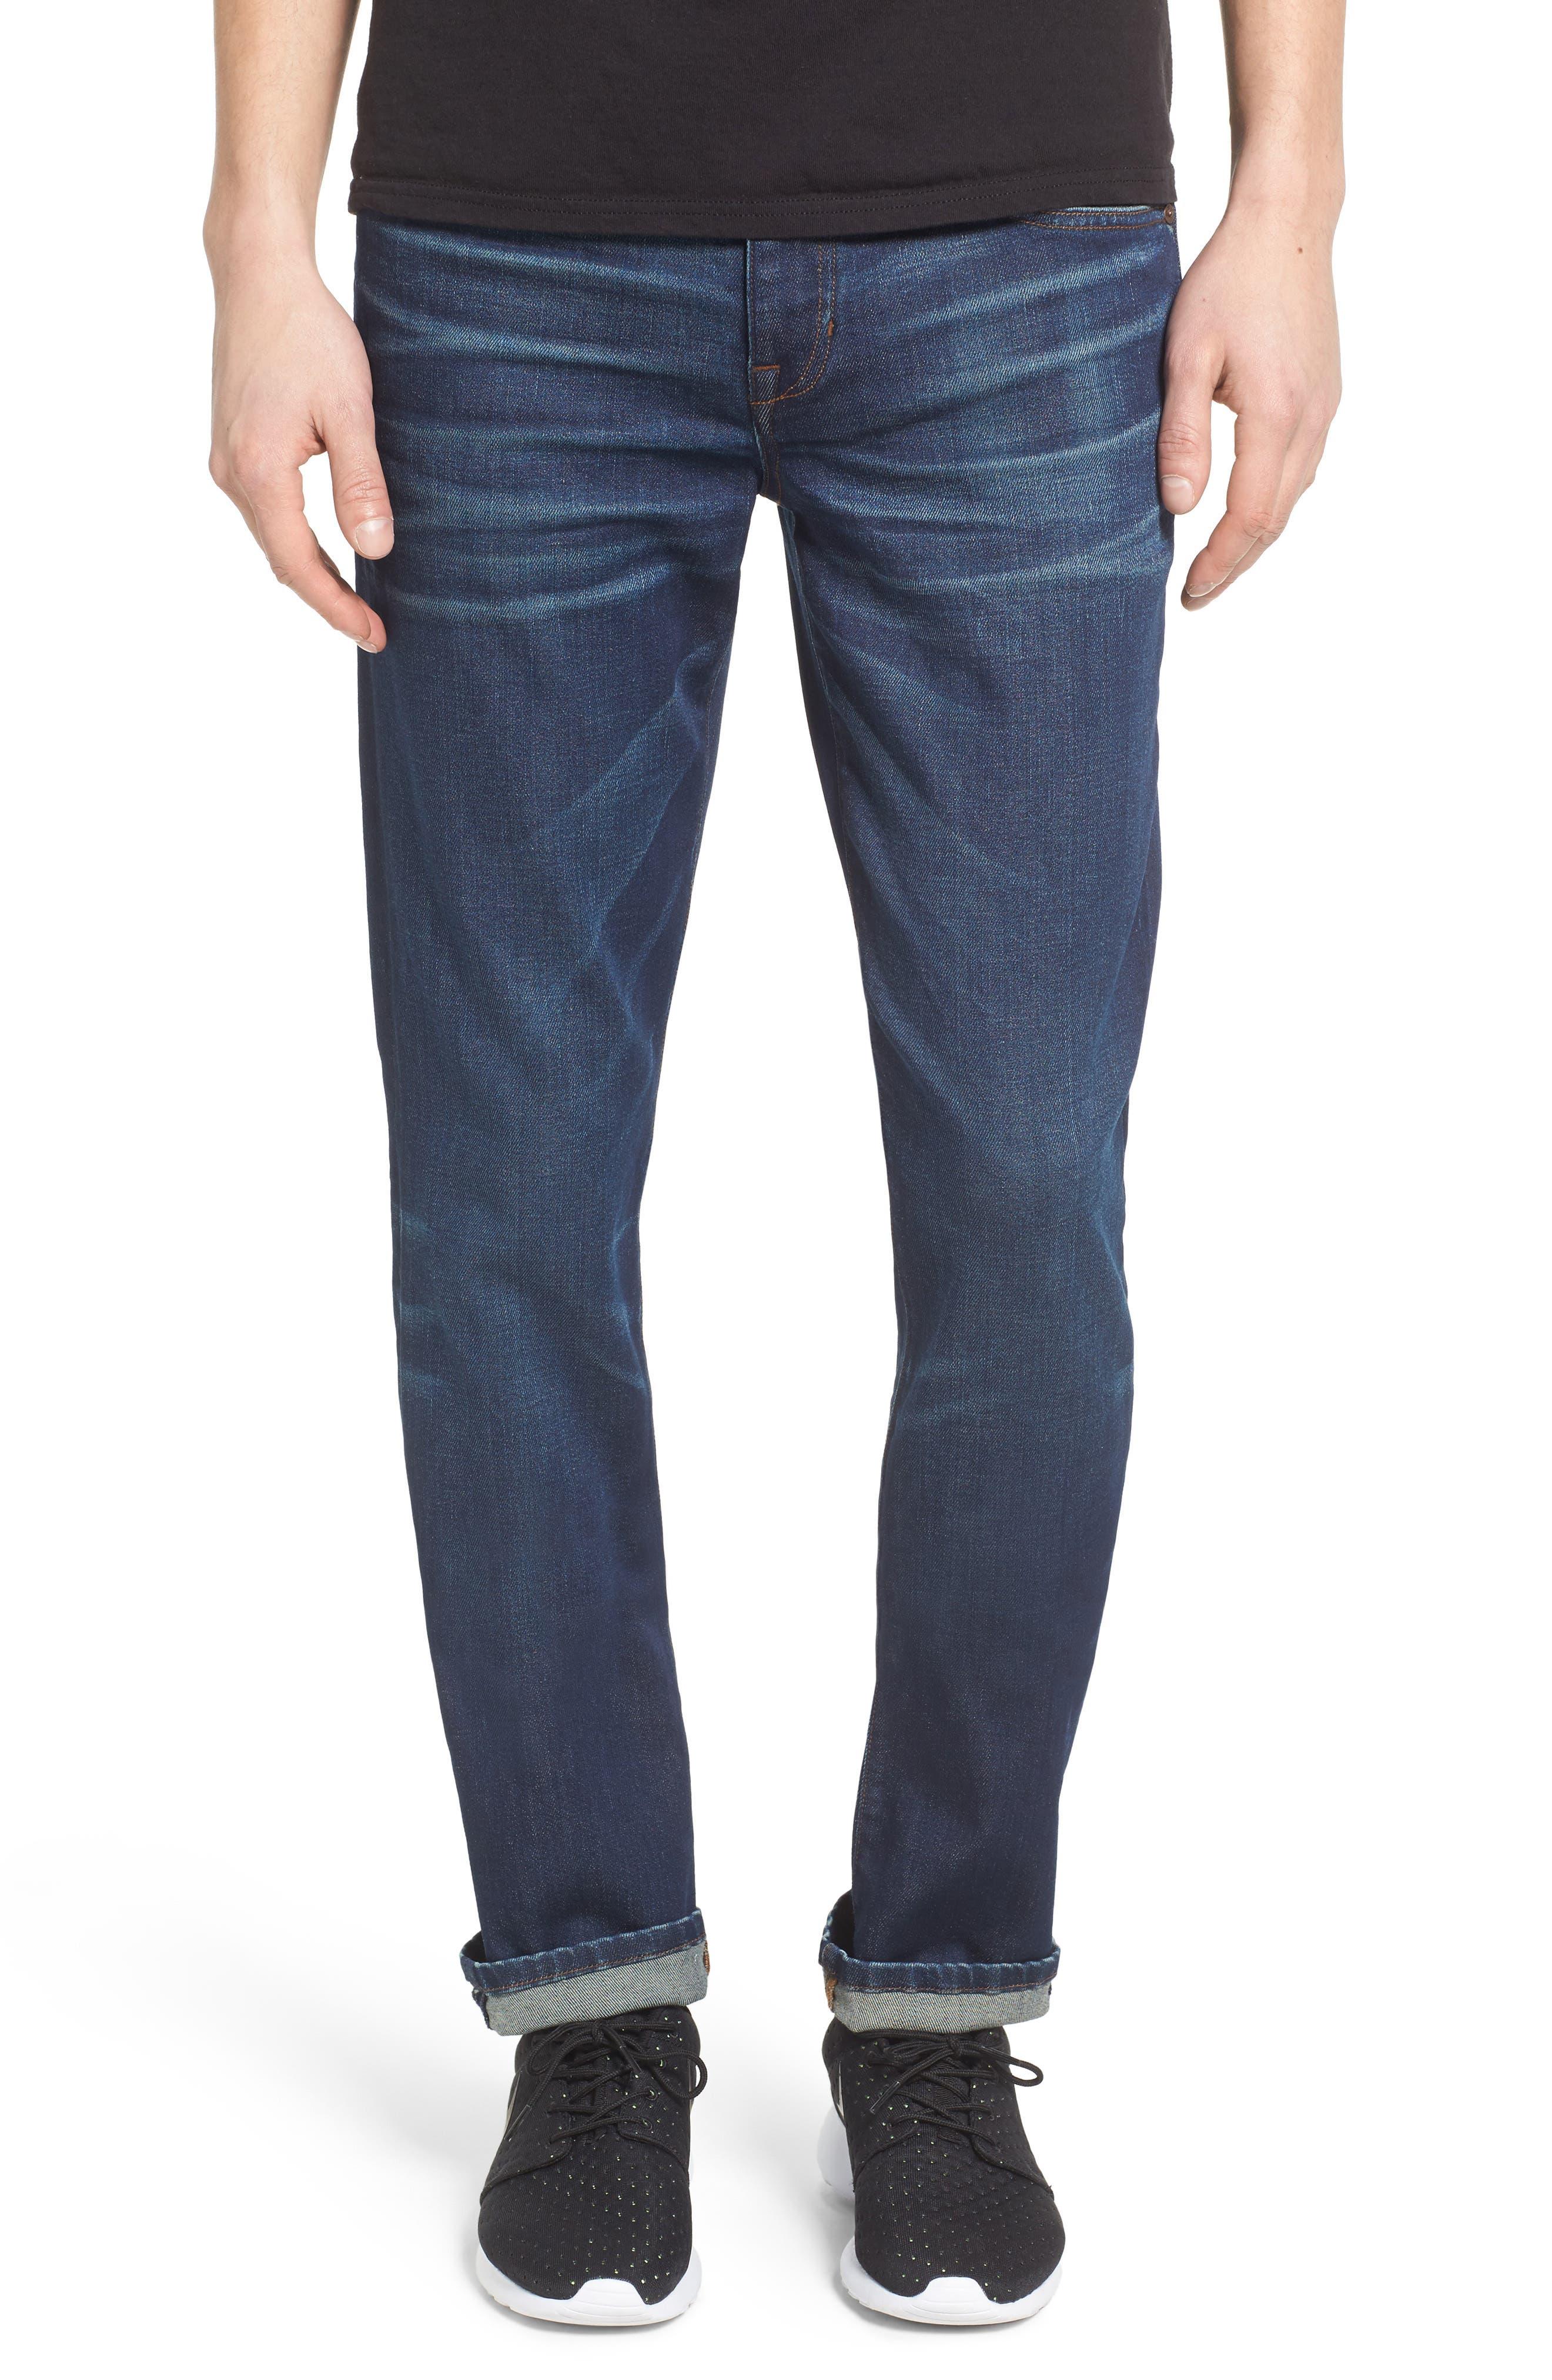 Joe's Slim Skinny Fit Jeans (Pinito)